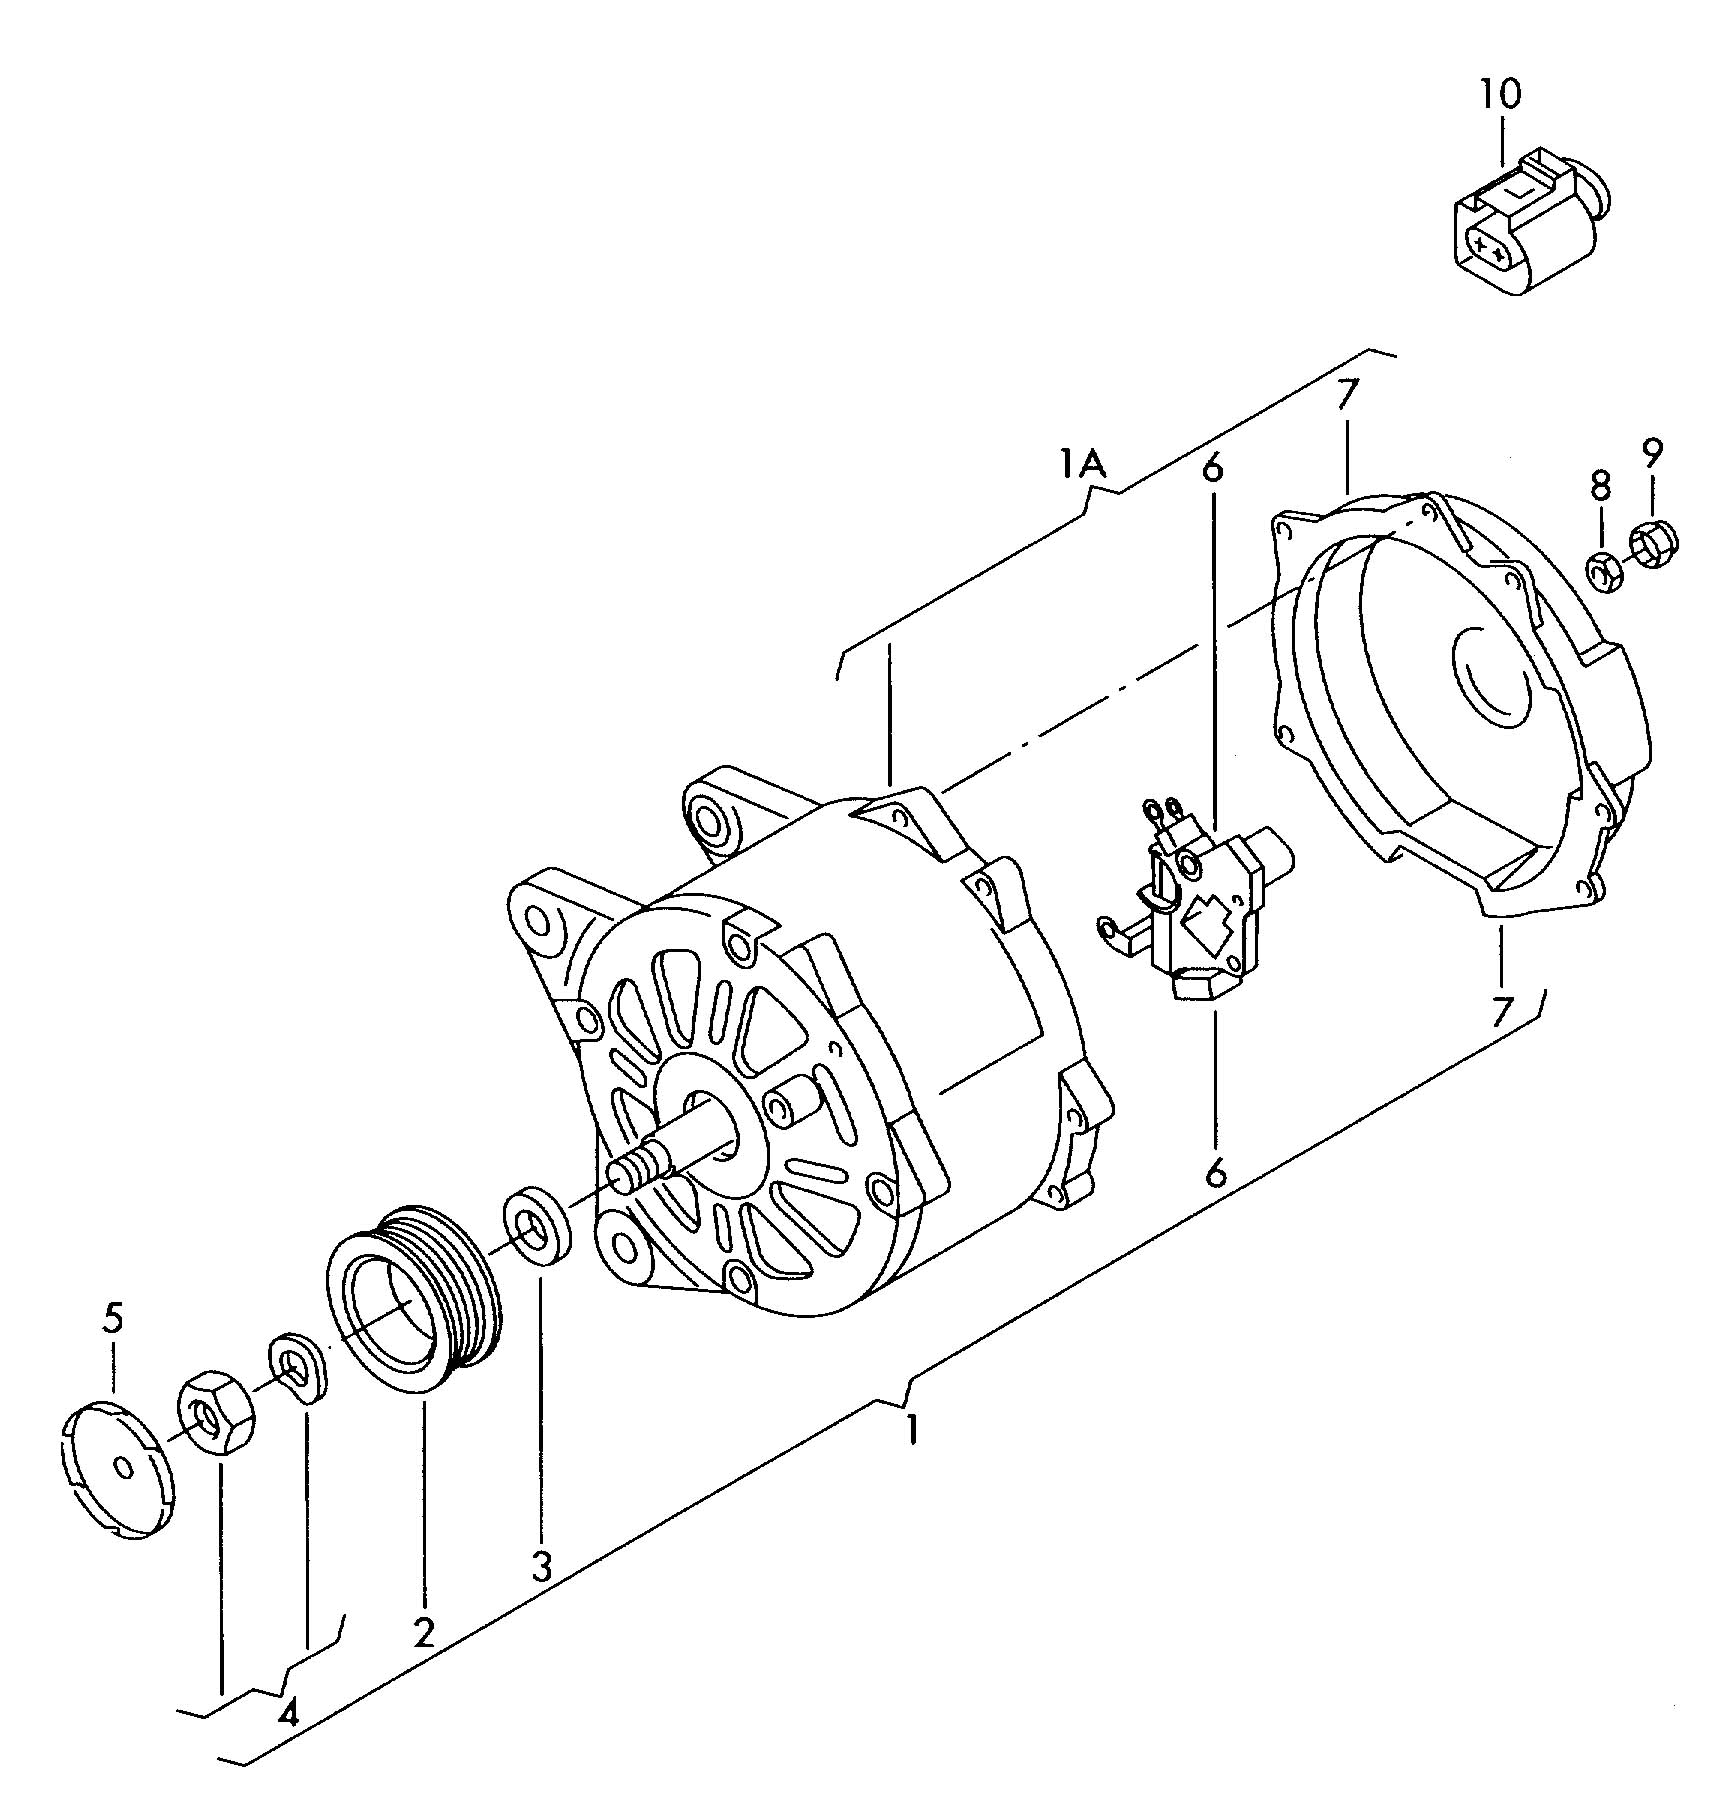 Volkswagen Tiguan Voltage regulator as required use: for